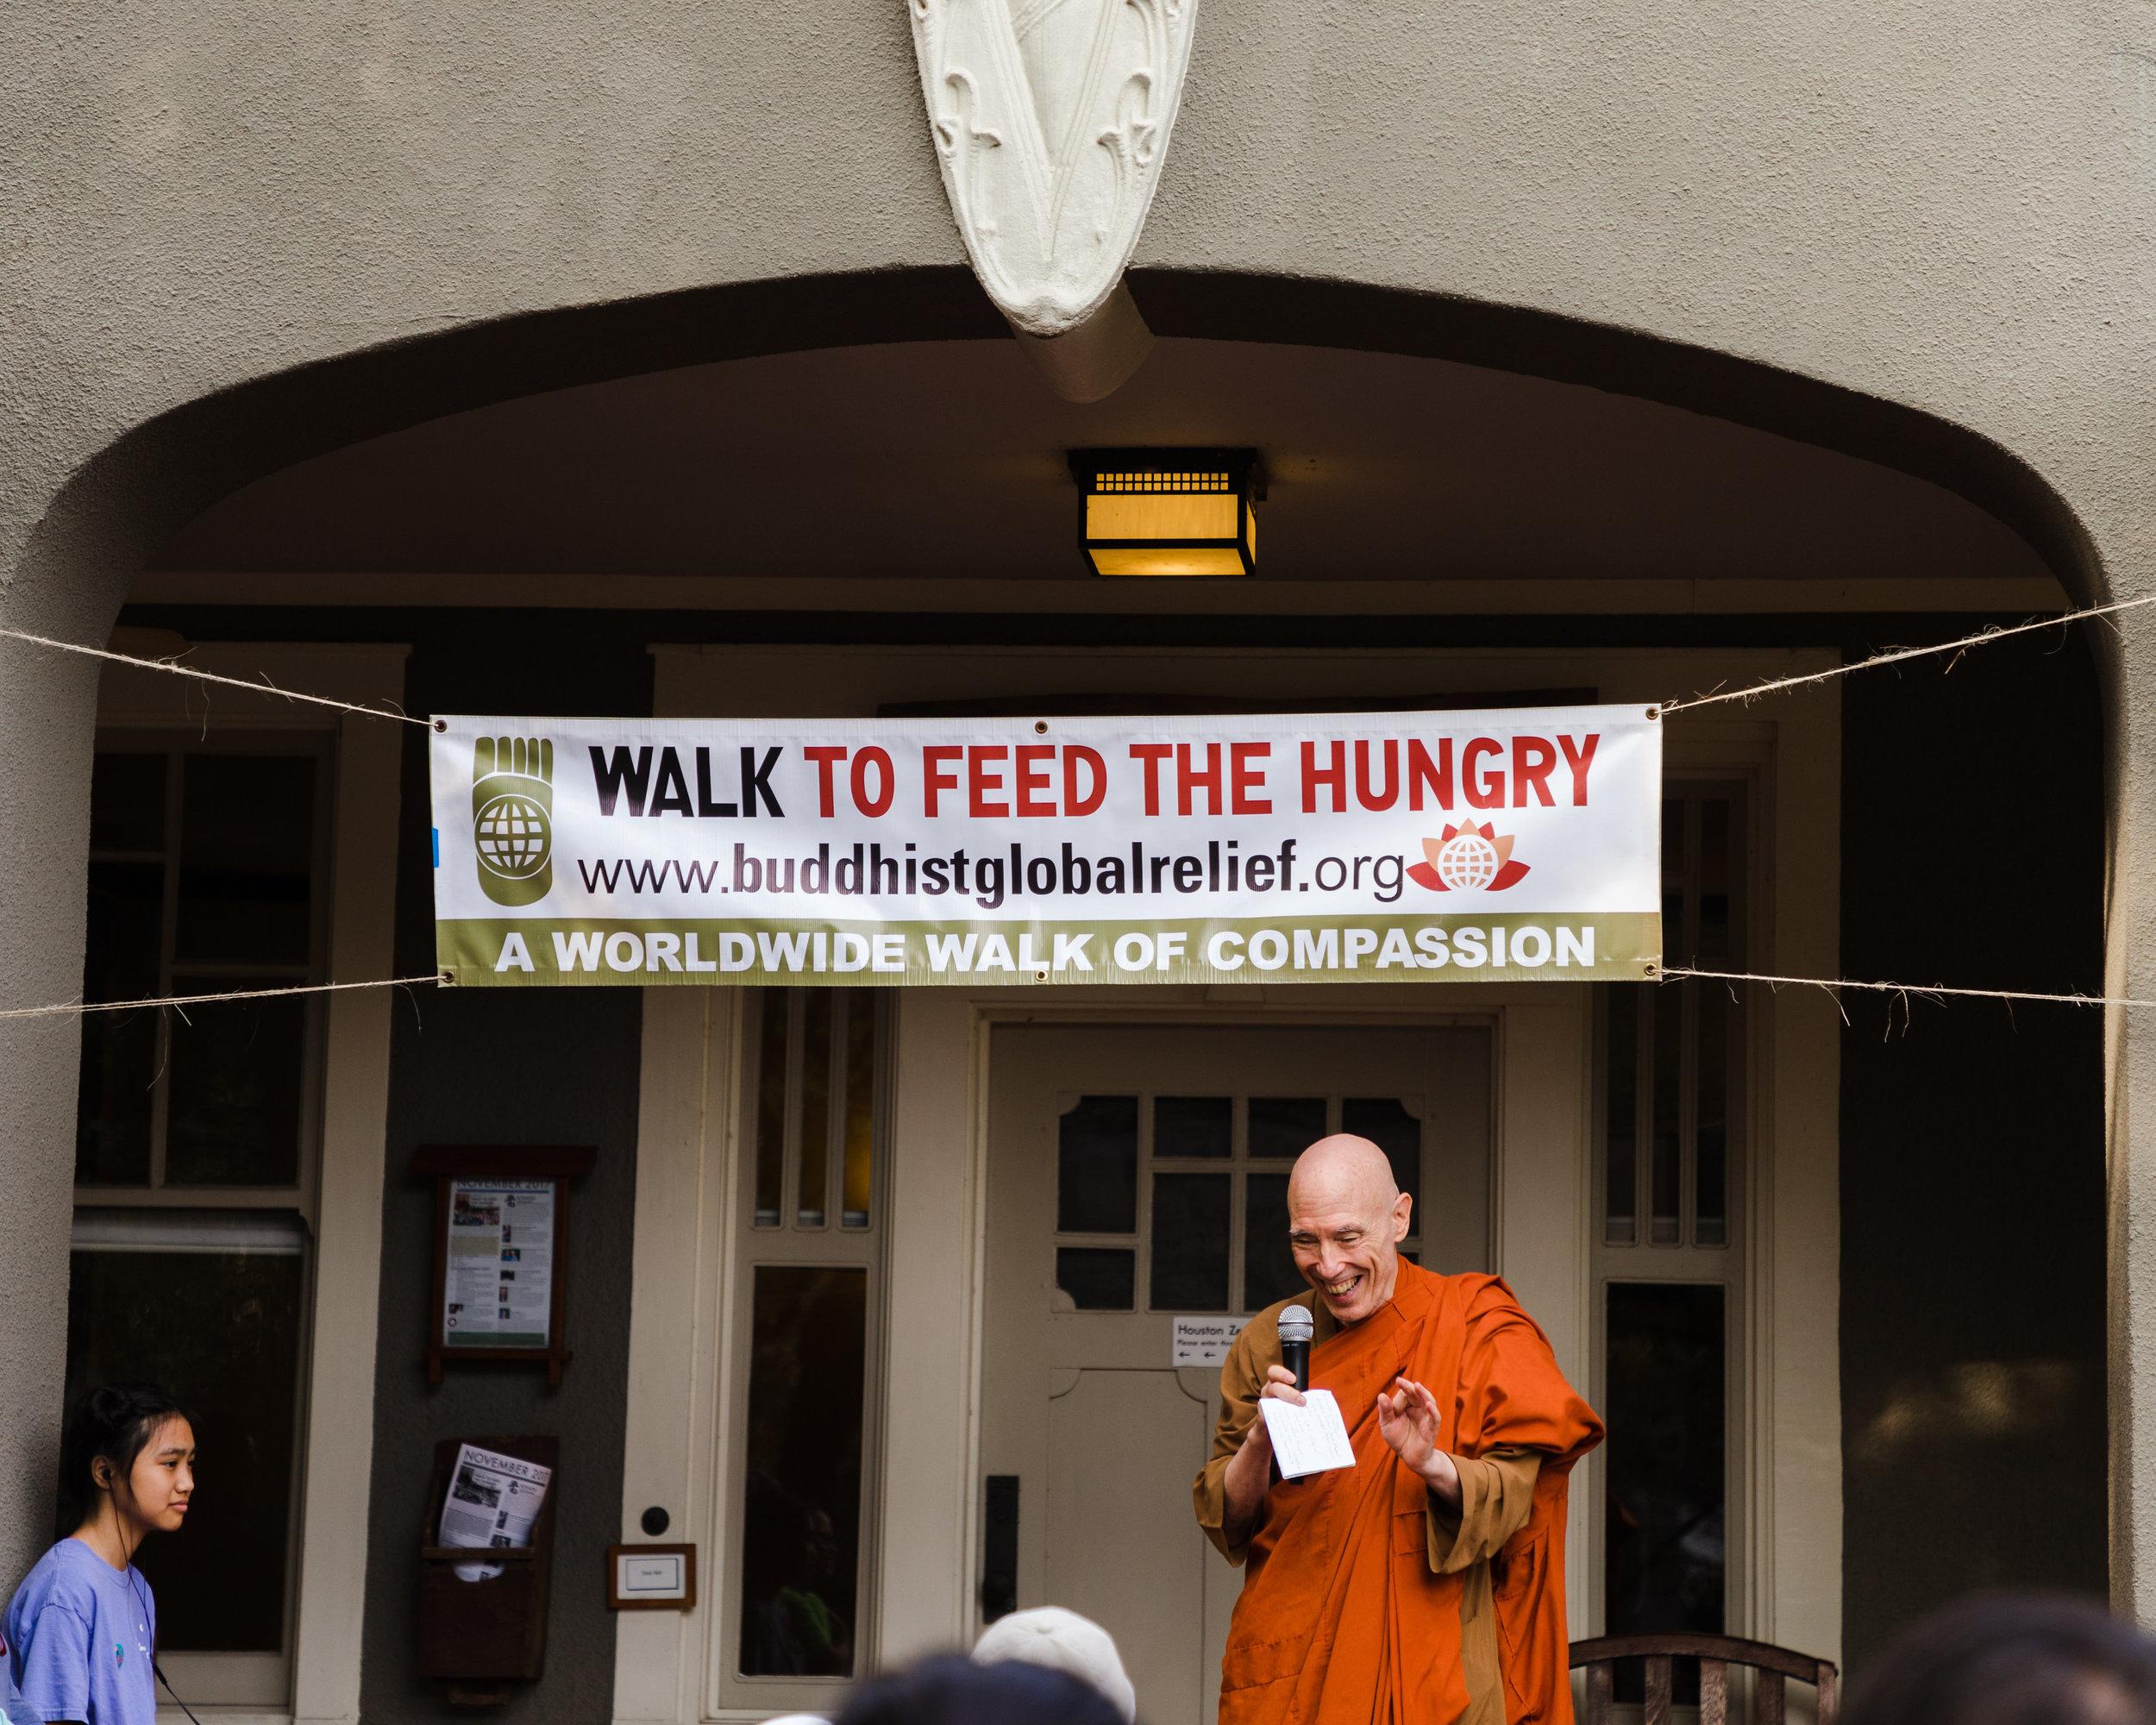 Bhikkhu-Bodhi-Global-Relief-Houston-Zen-Walk-32.jpg